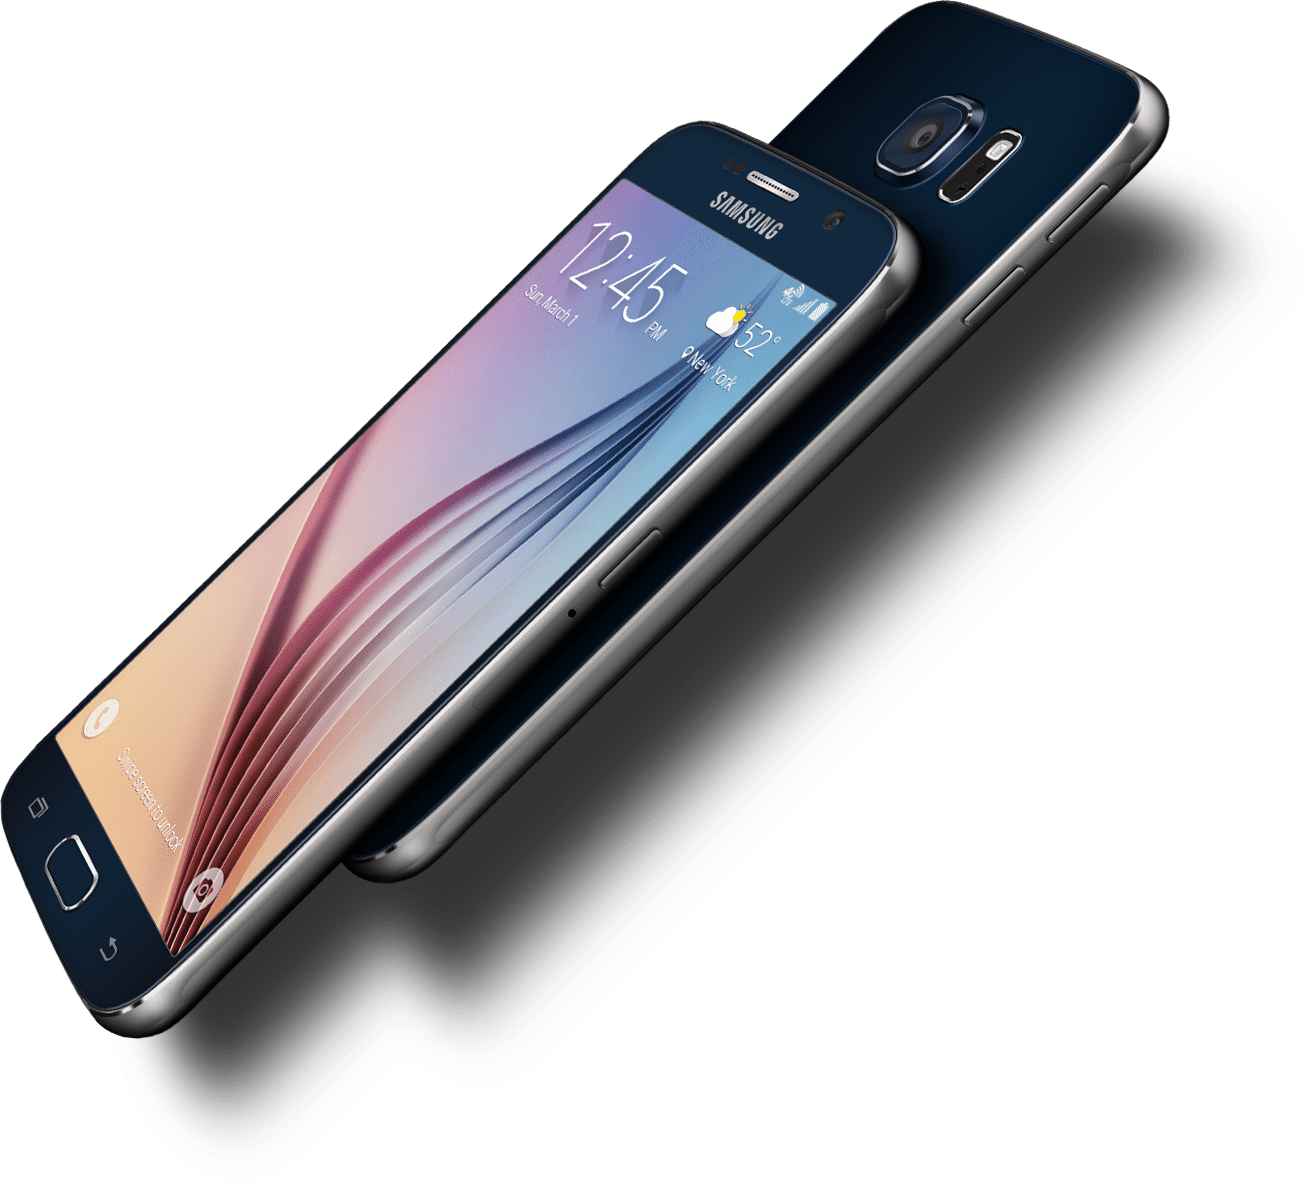 Galaxy S6 Edge có giá đắt hơn Galaxy S6 - 3